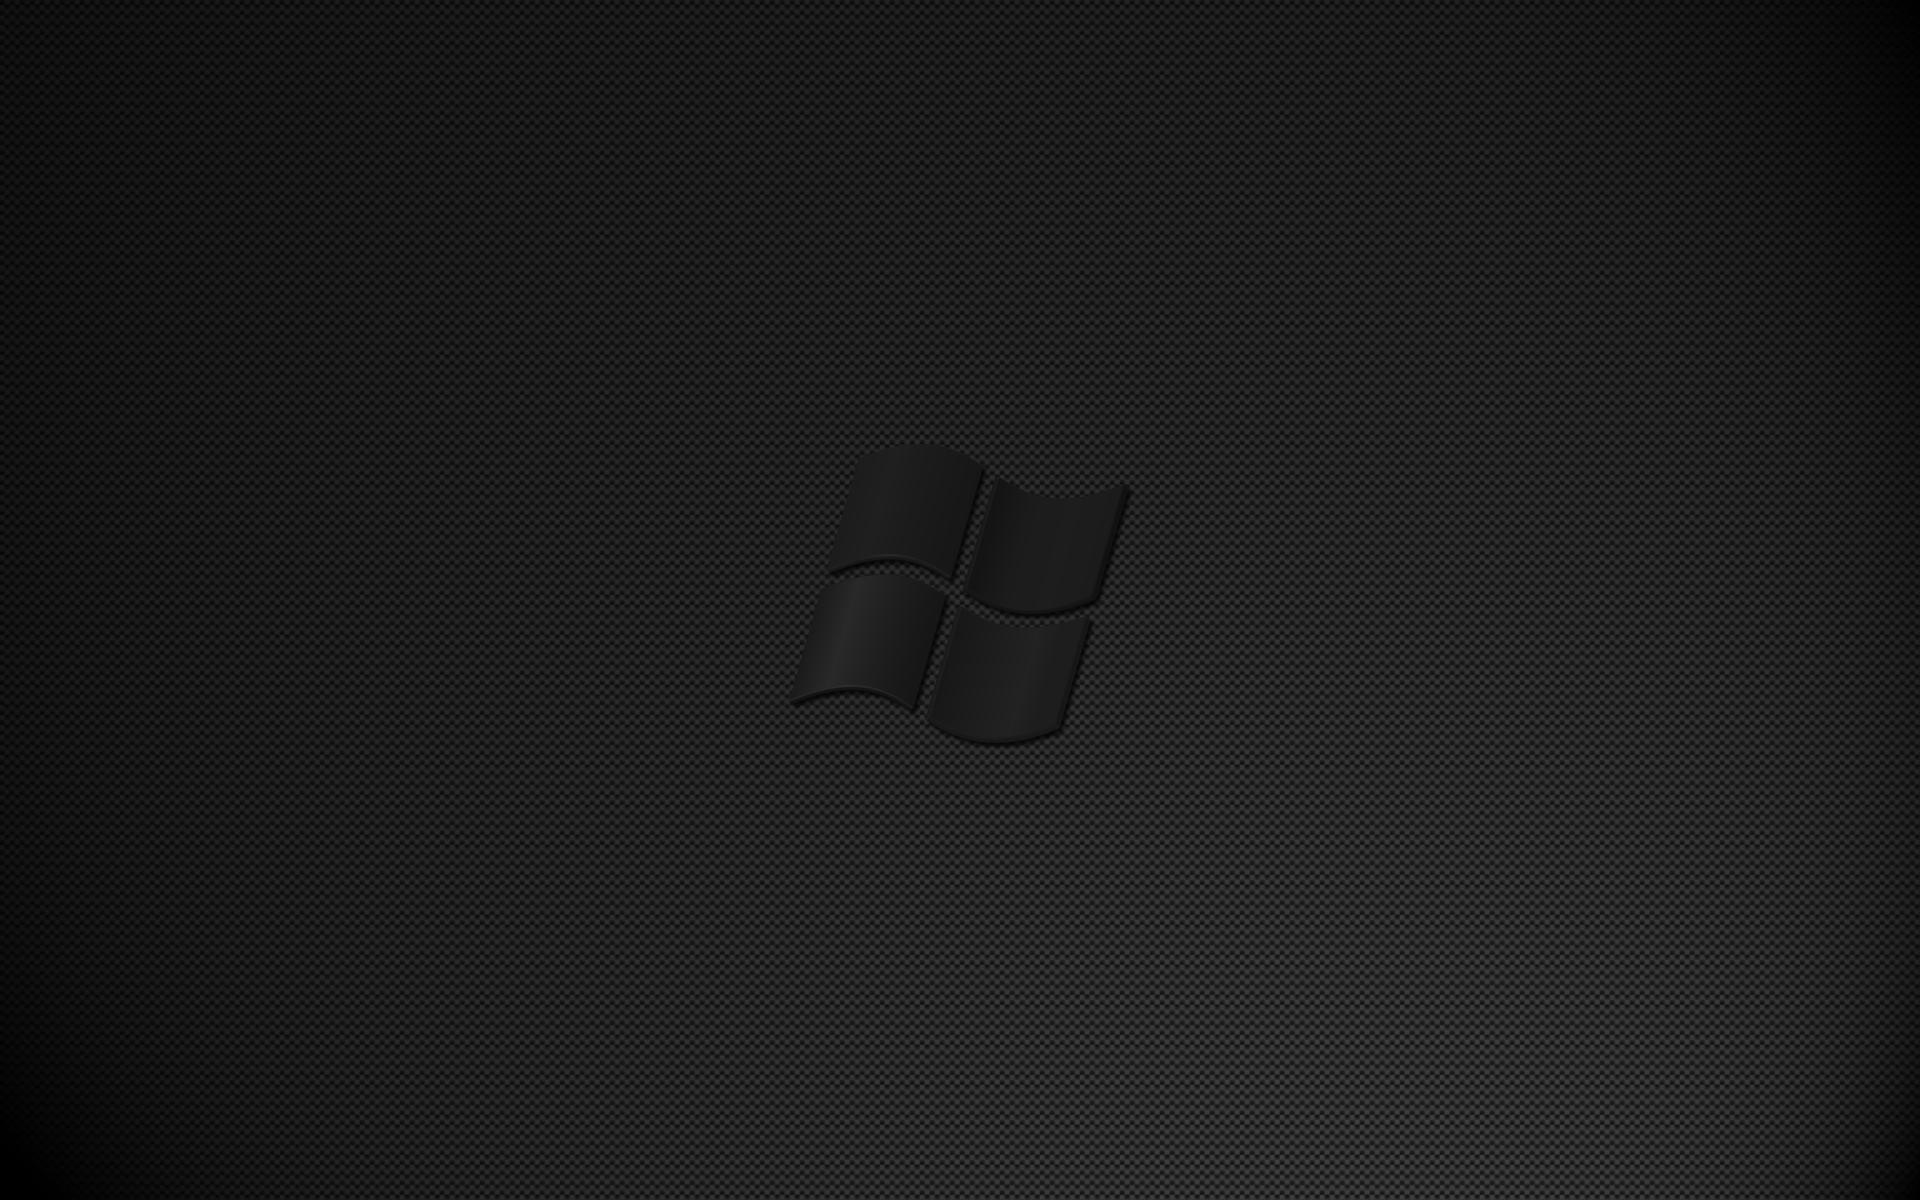 Group Of Windows Black Wallpaper